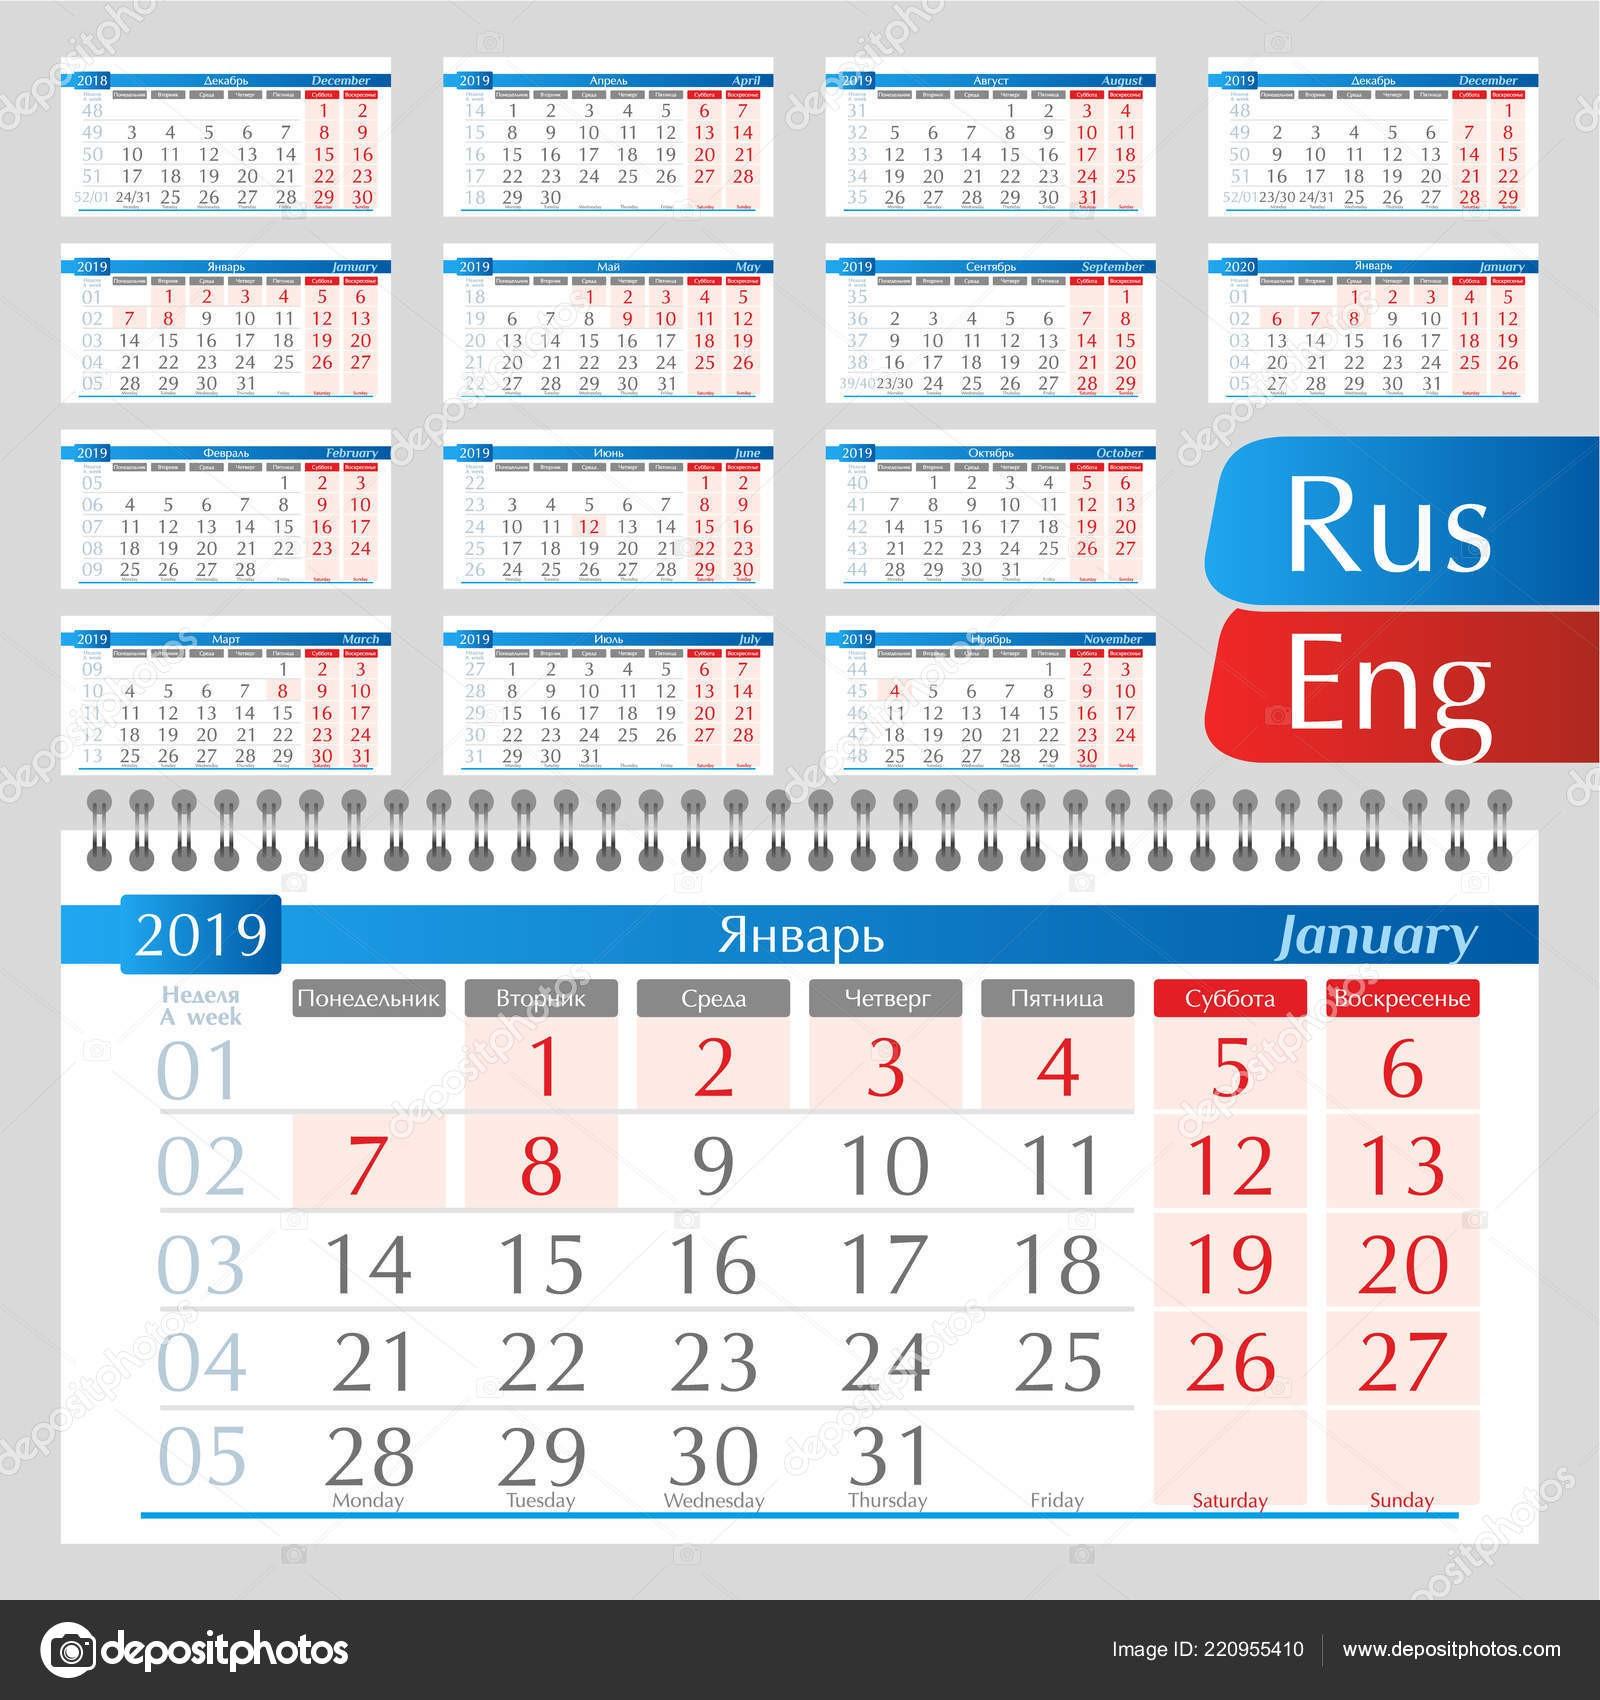 March Calendar Vector Más Actual Calendar Quarters 2019 Lara Expolicenciaslatam Of March Calendar Vector Actual Data Involving event Calendar March Calendar Online 2019